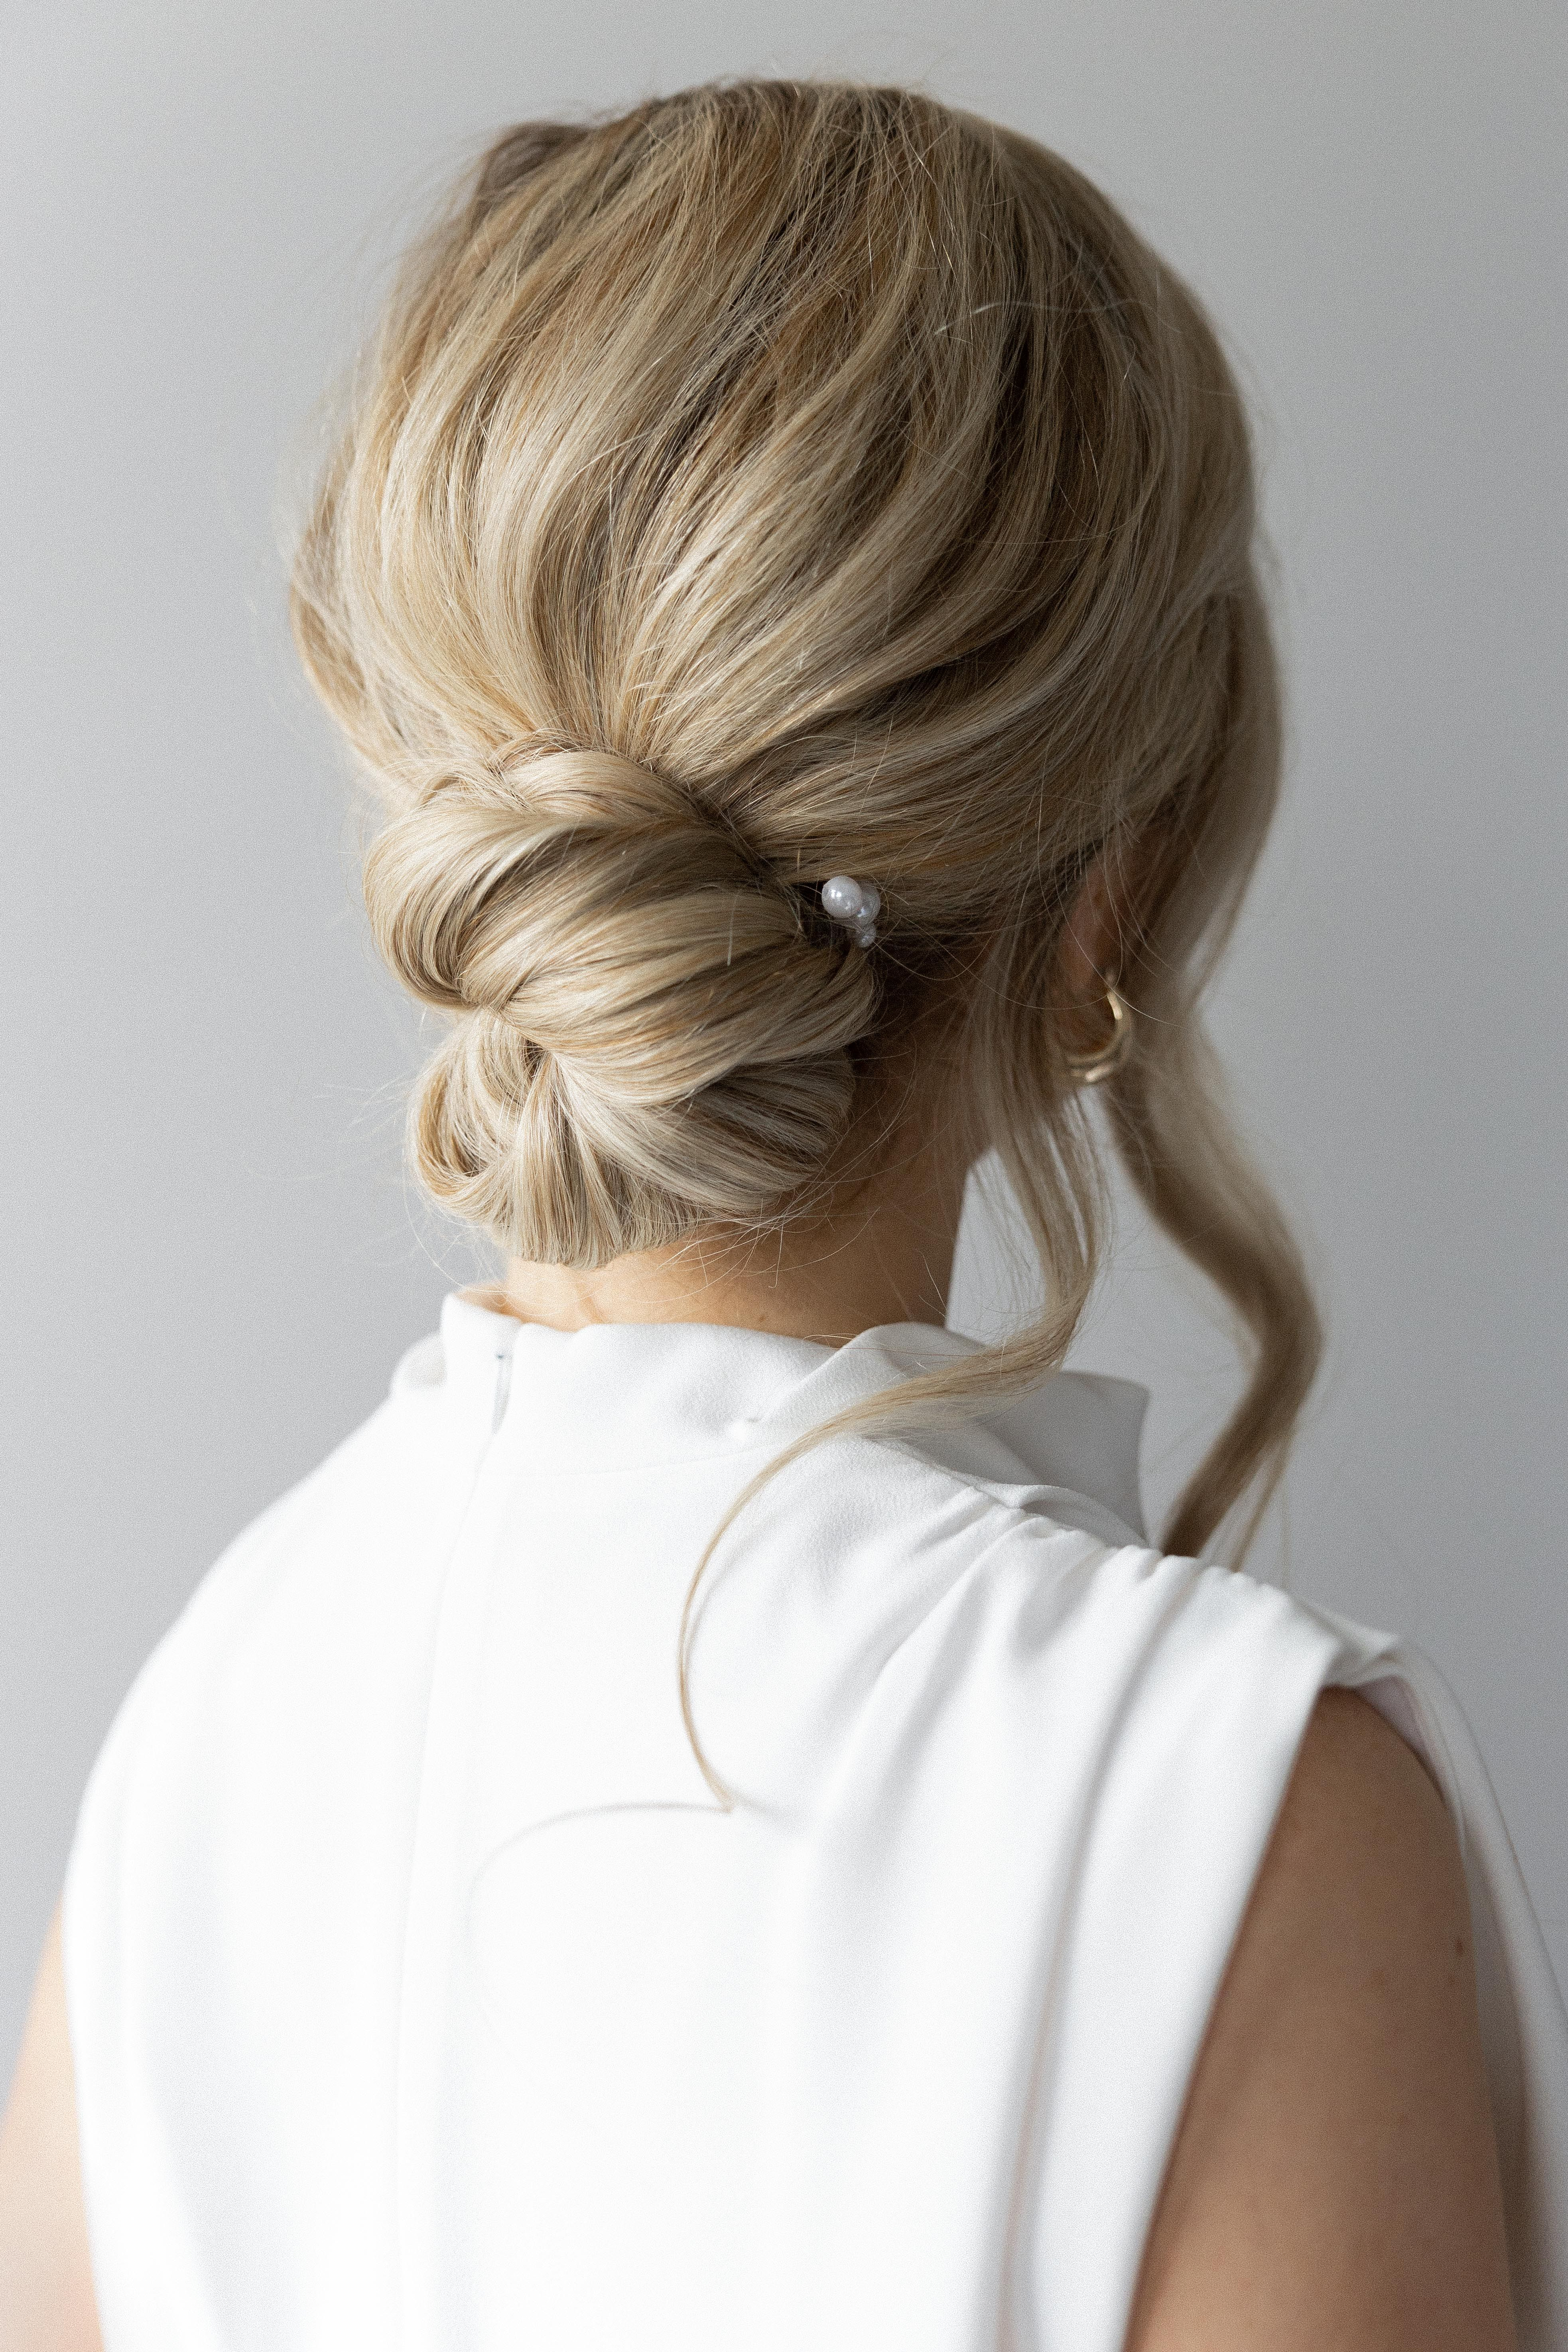 EASY Updo Hairstyle Long + Medium Hair Wedding, Prom, Bridal in 2020 | Easy  updo hairstyles, Easy hair updos, Medium hair styles